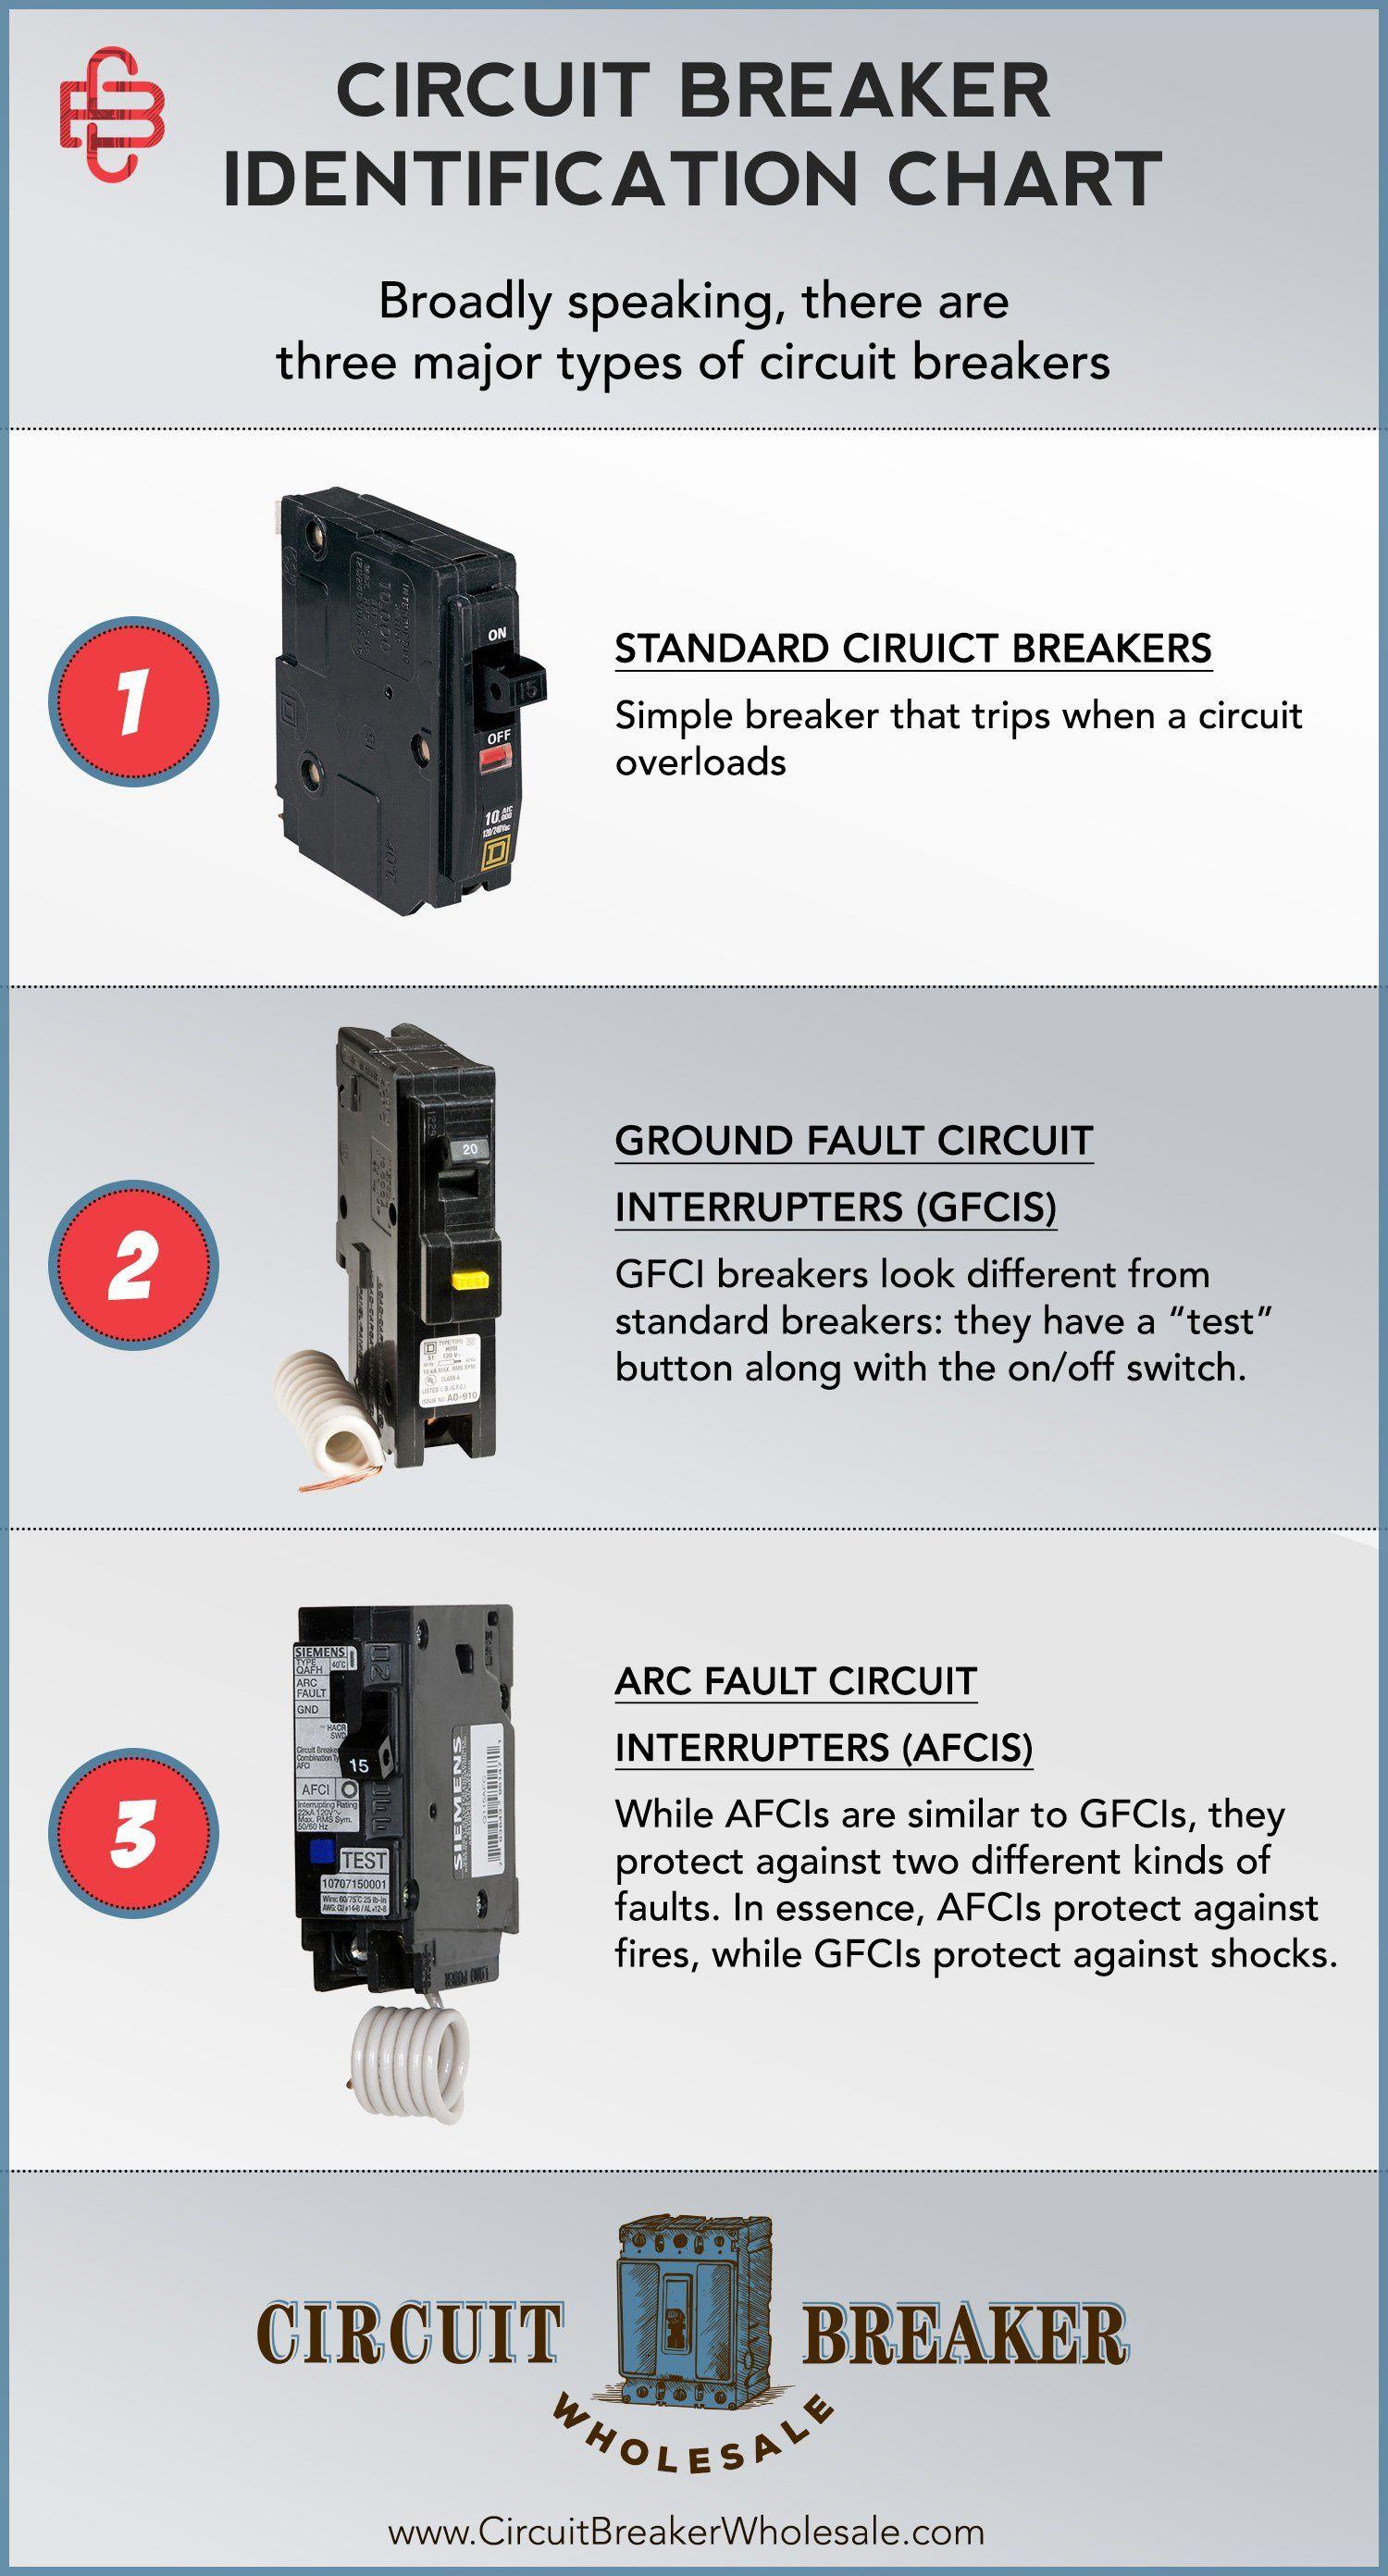 How To Identify Circuit Breaker Types Circuit Breaker Wholesale In 2021 Breakers Circuit Electrical Breakers